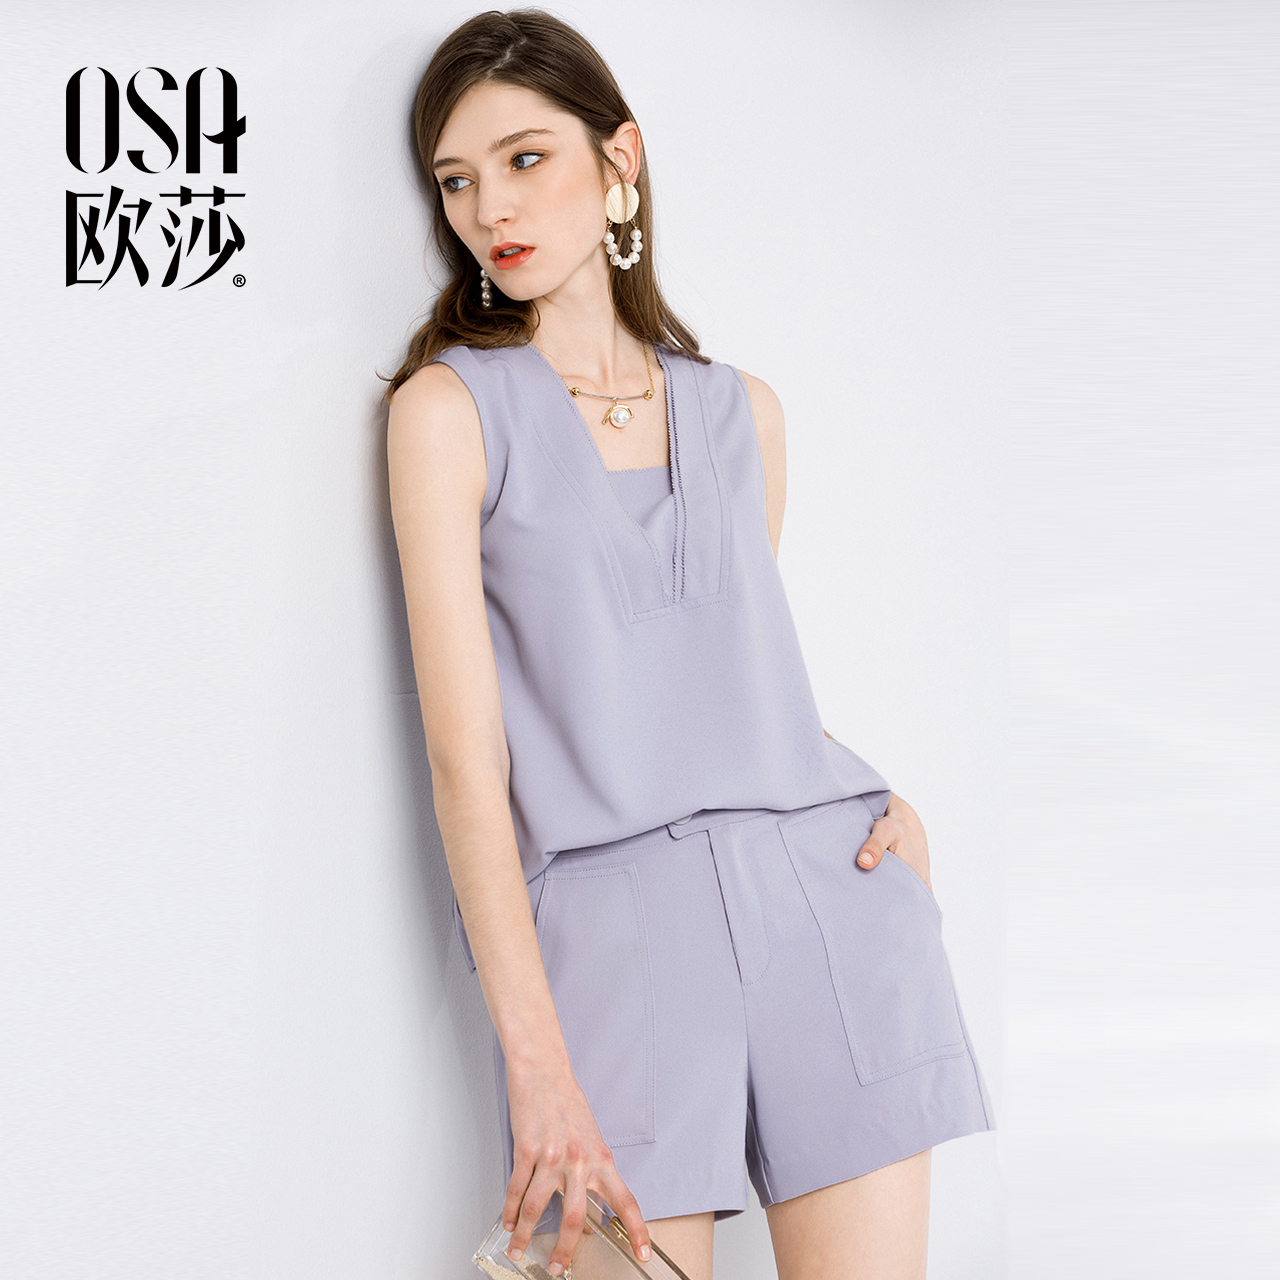 OSA欧莎2018夏装新款女装气质干练简约时两件套套装